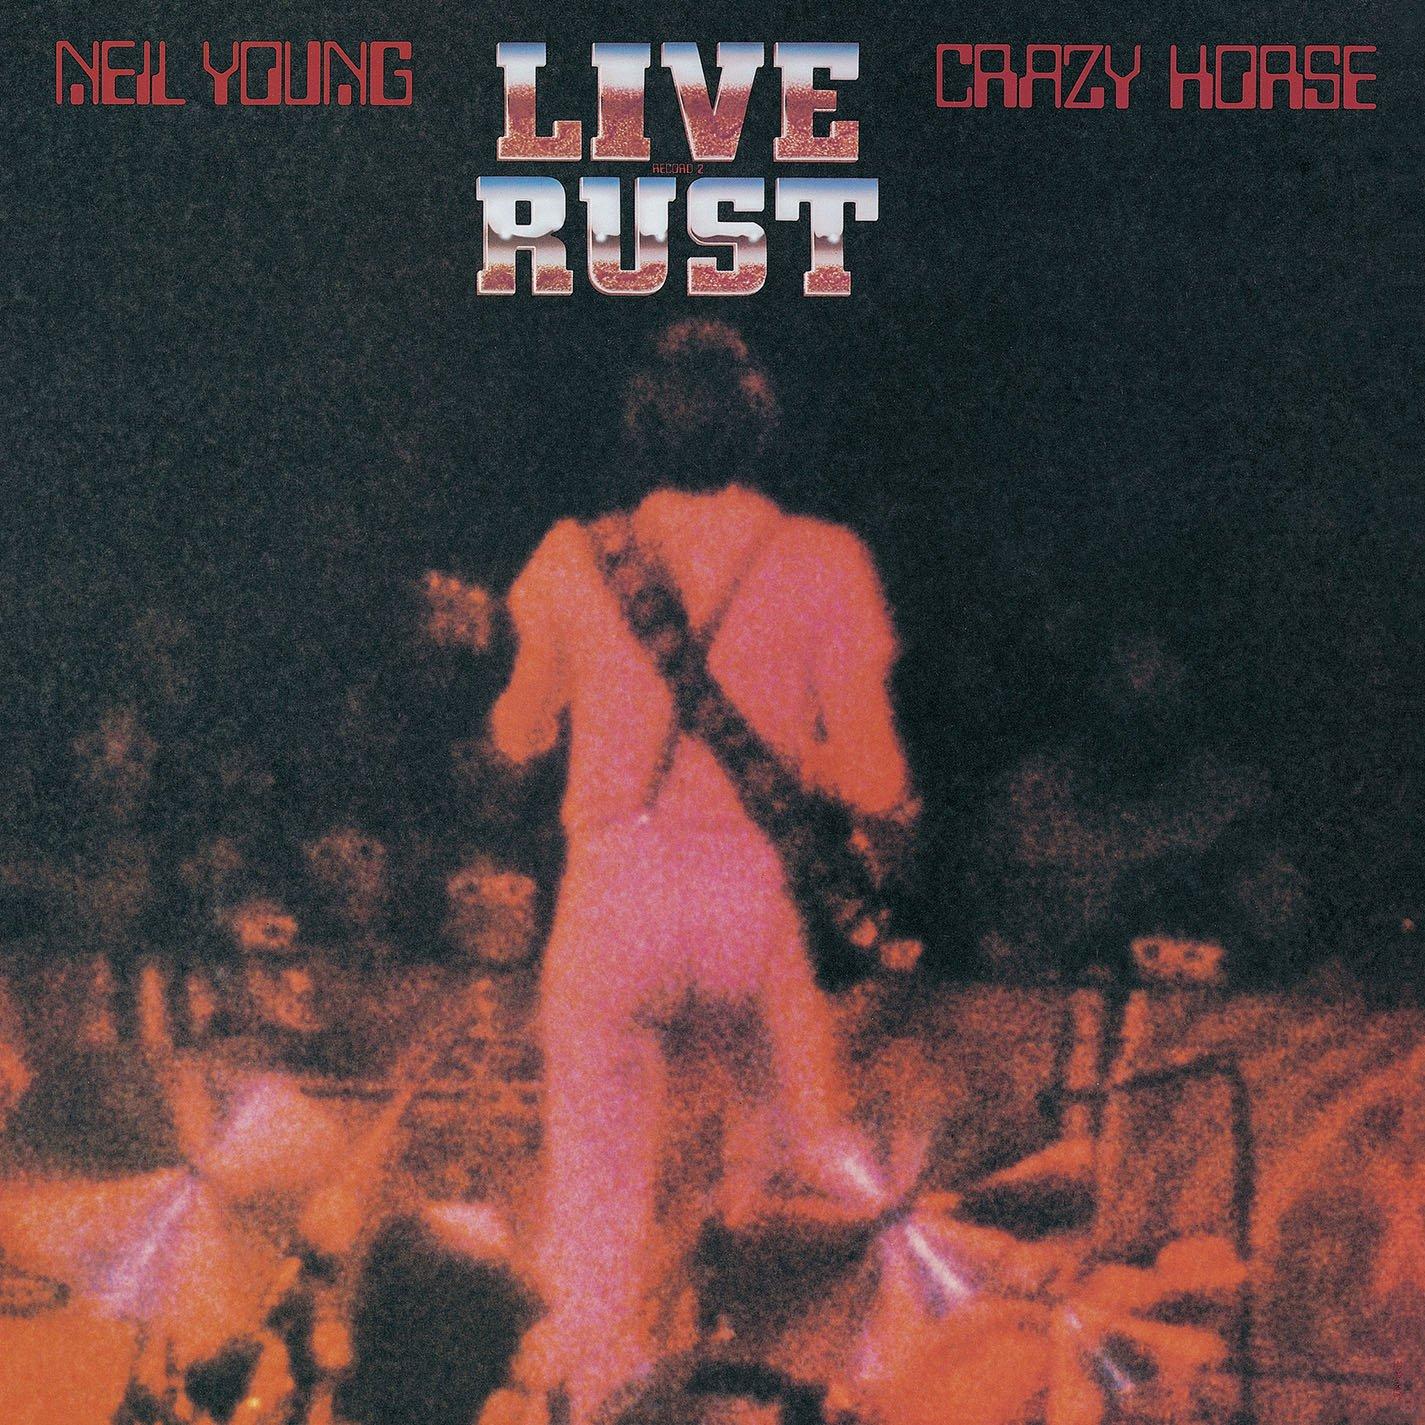 Neil Young & Crazy Horse - Live Rust [2xLP]